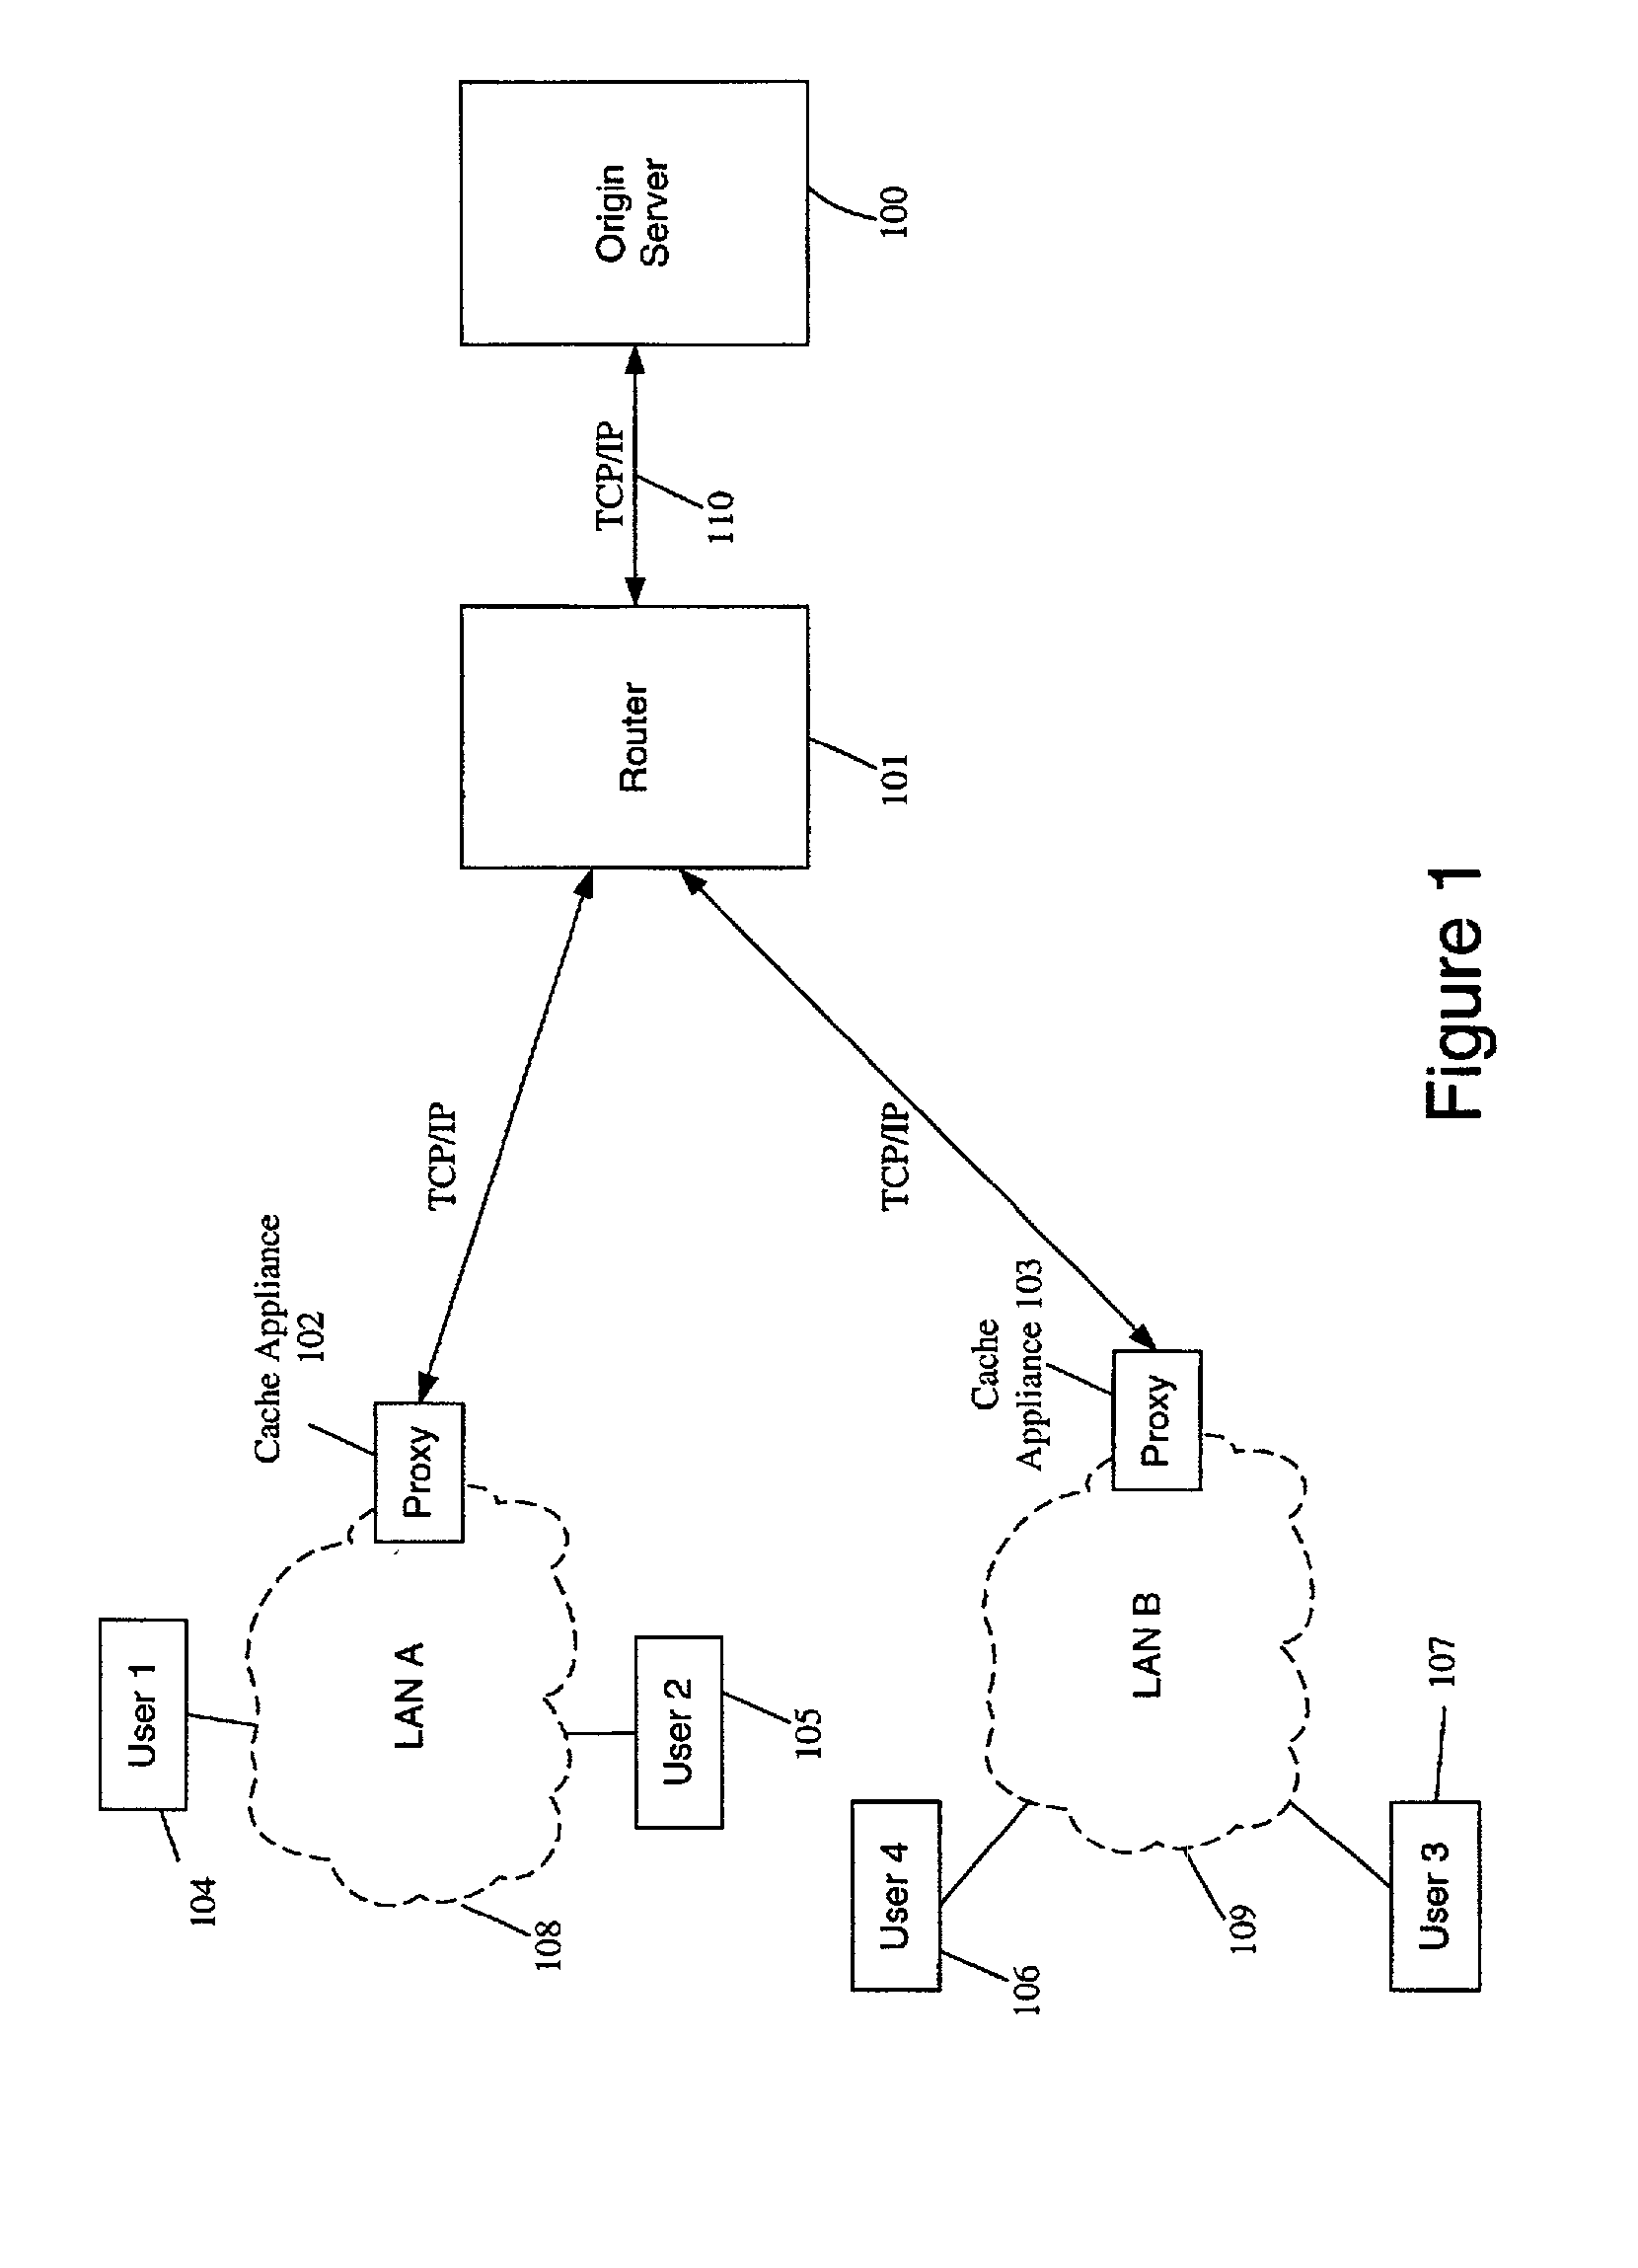 t1 cable diagram wiring diagram database Cat5 Cable Wiring t1 rj 48 pinout wiring diagram database fiber cable diagram t1 cable diagram